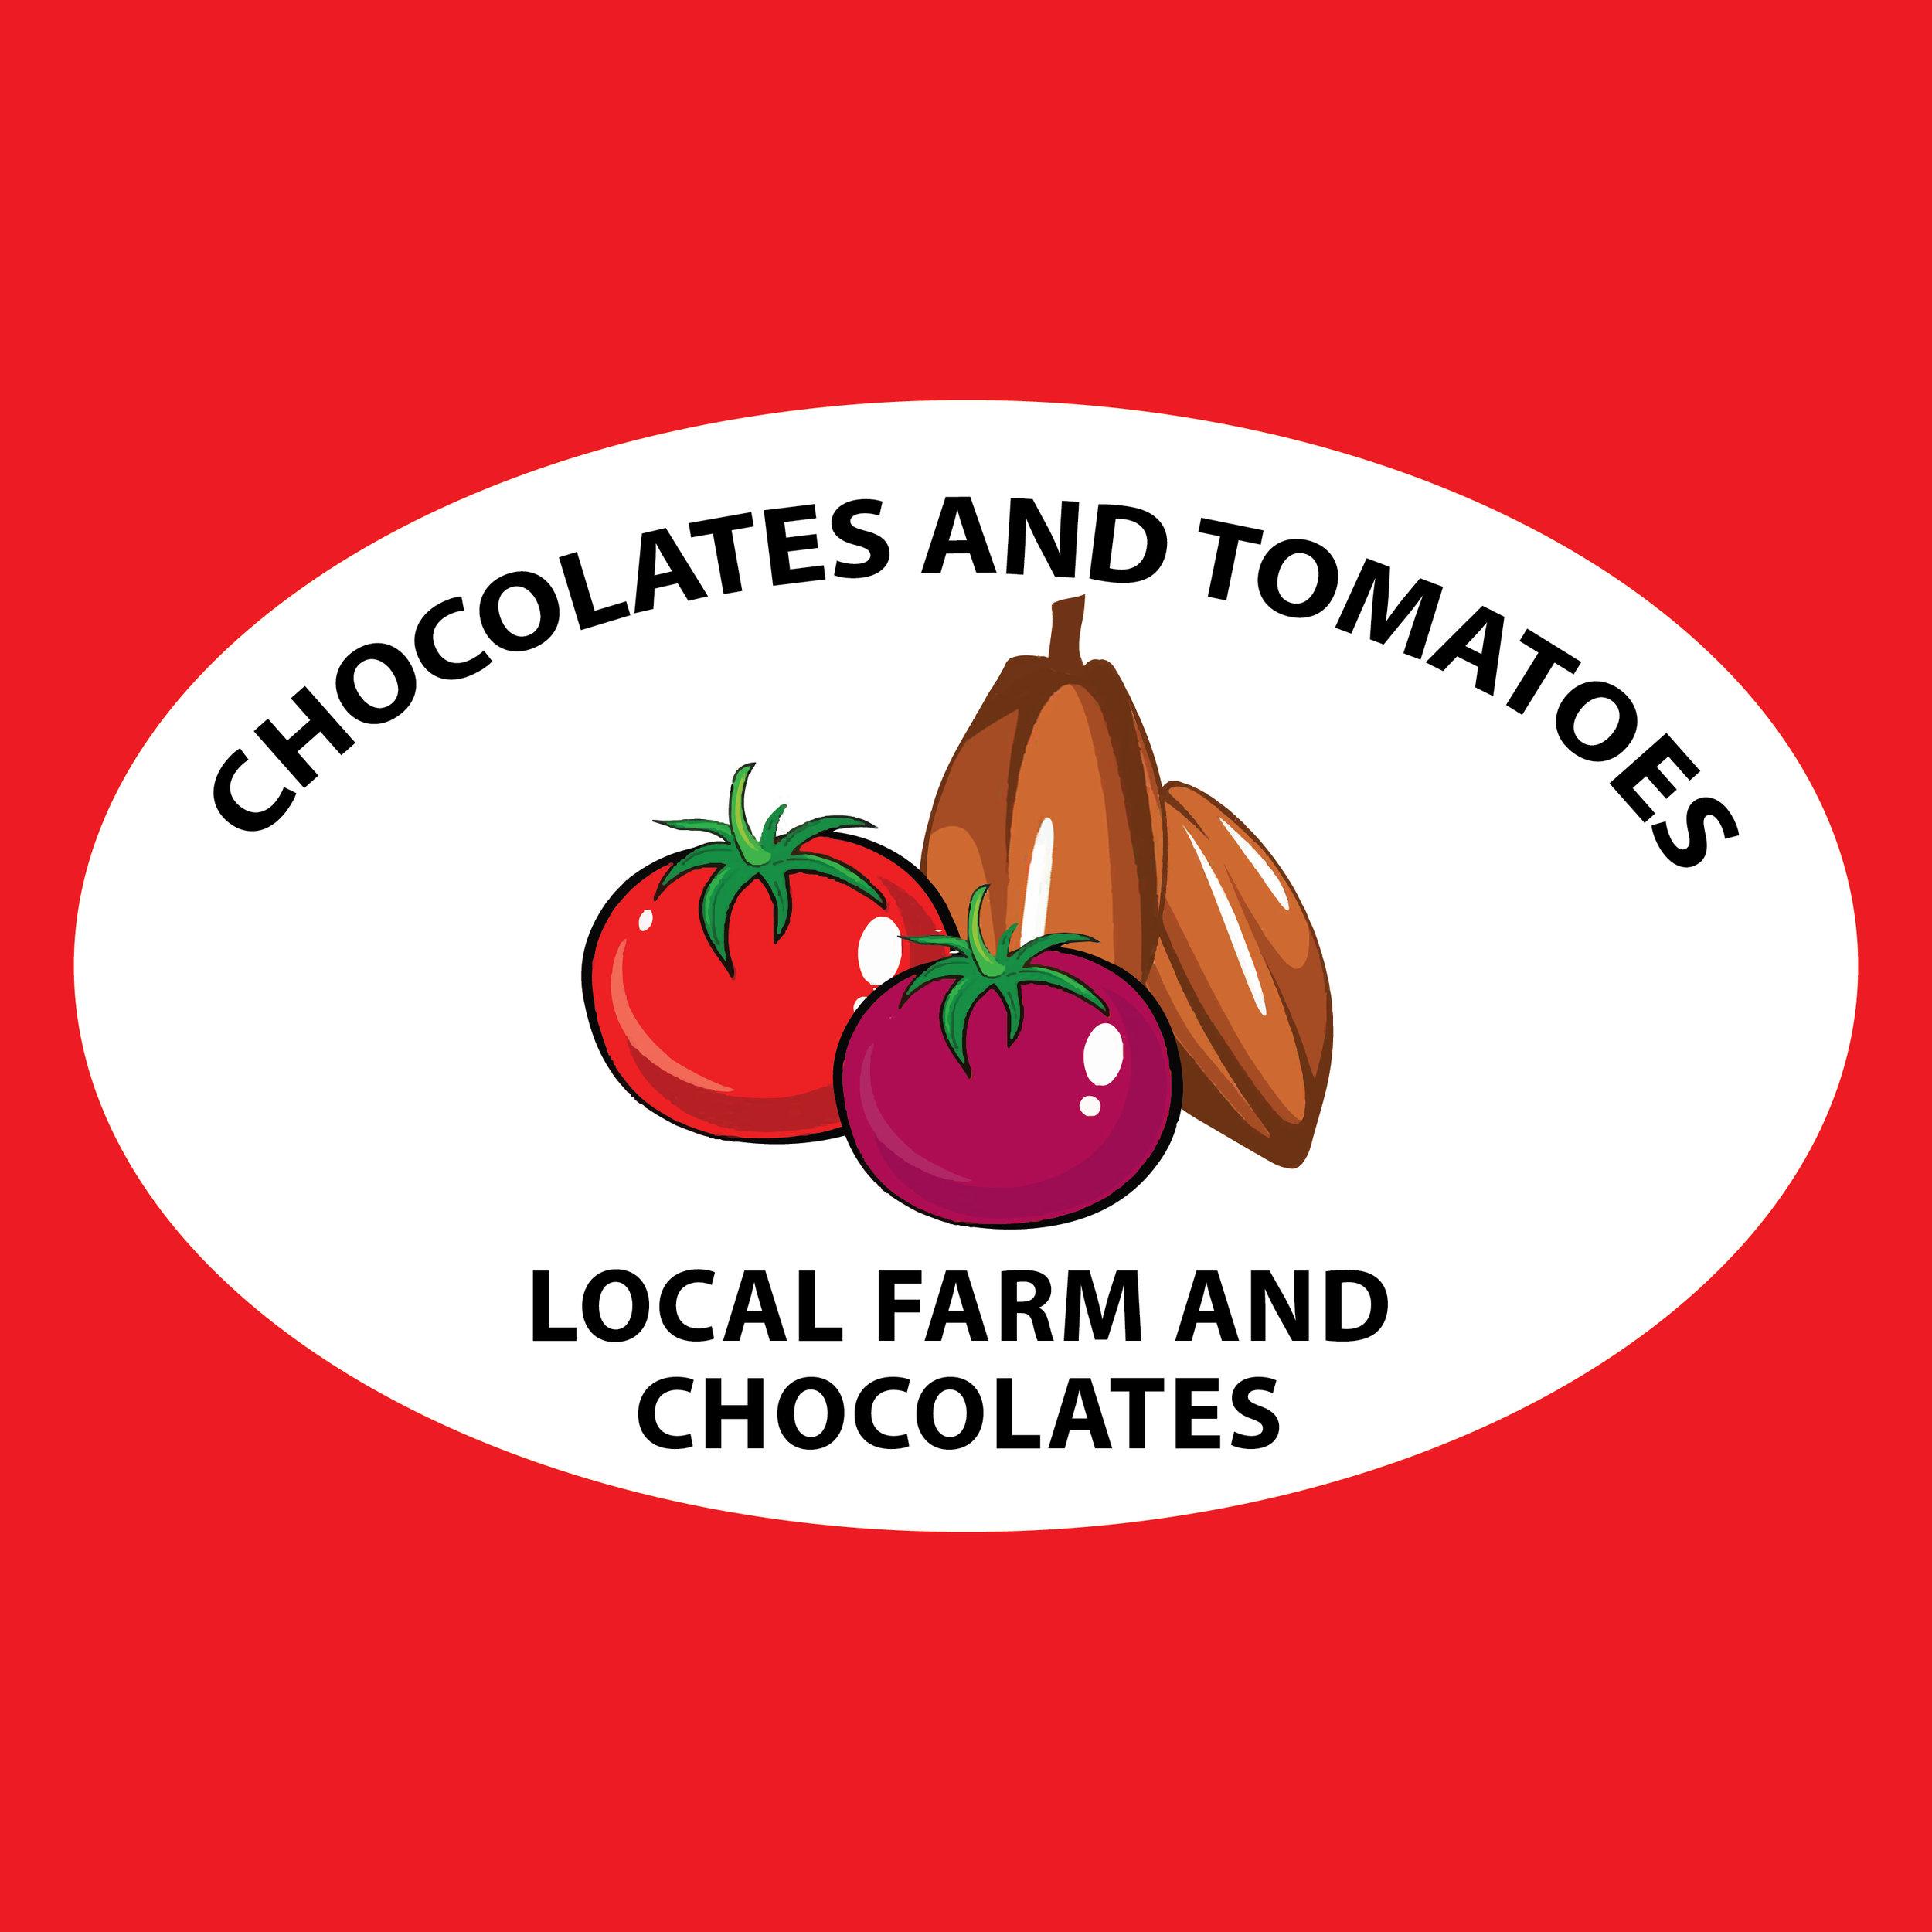 chocolates_tomatoes_red_logo.jpg